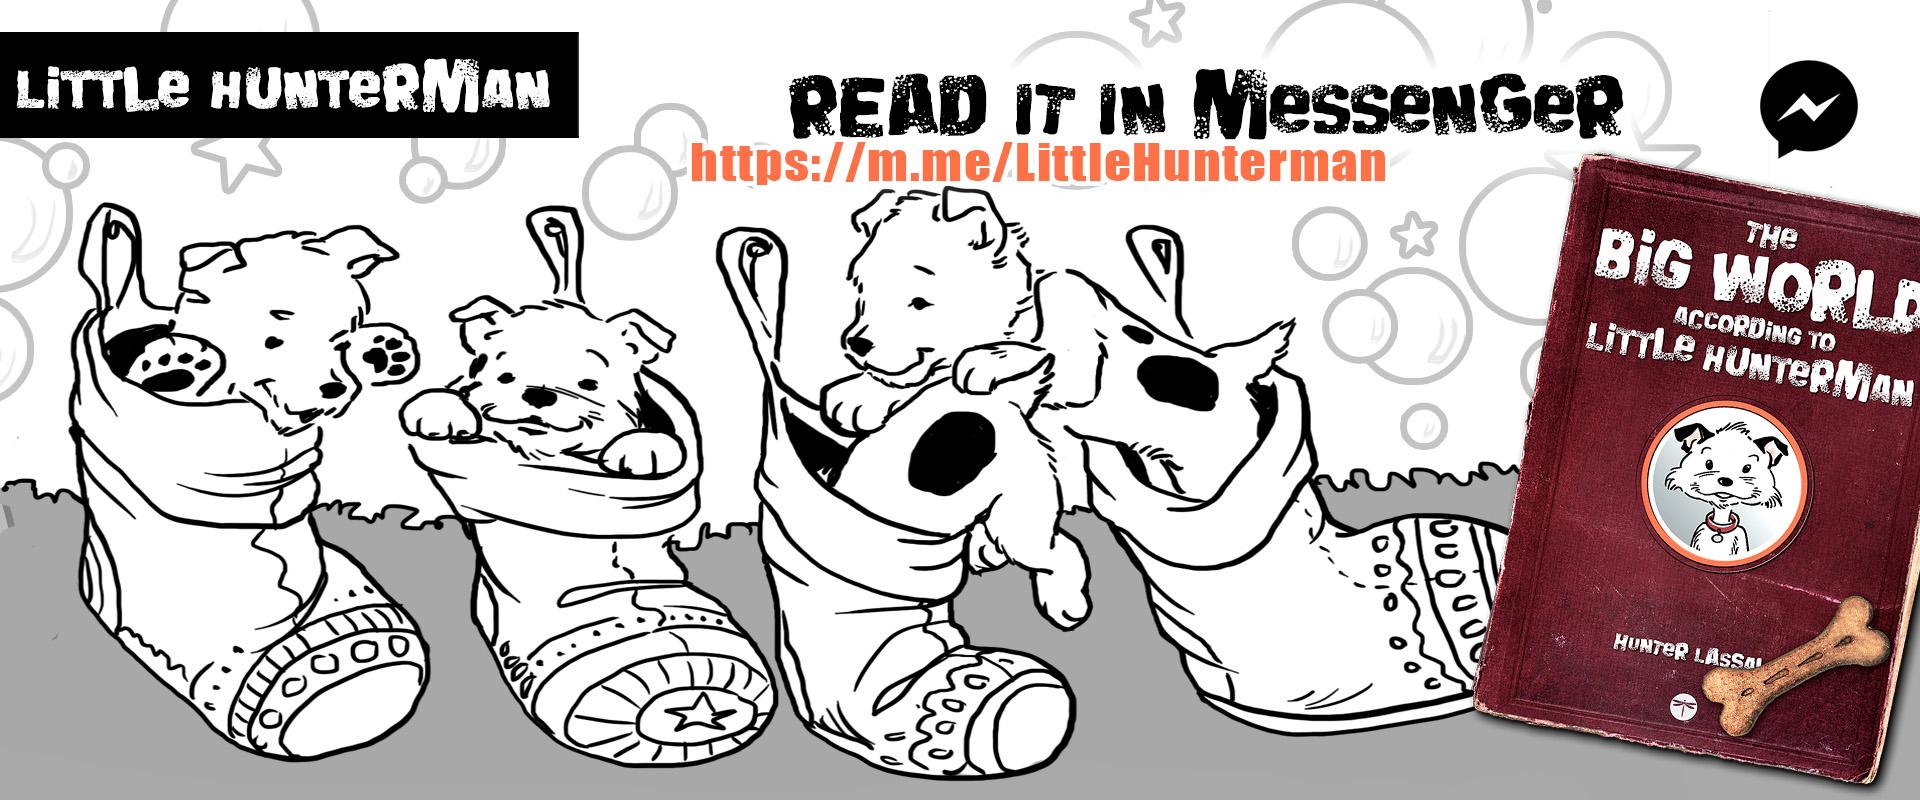 The Big World According to Little Hunterman / DONE!!!